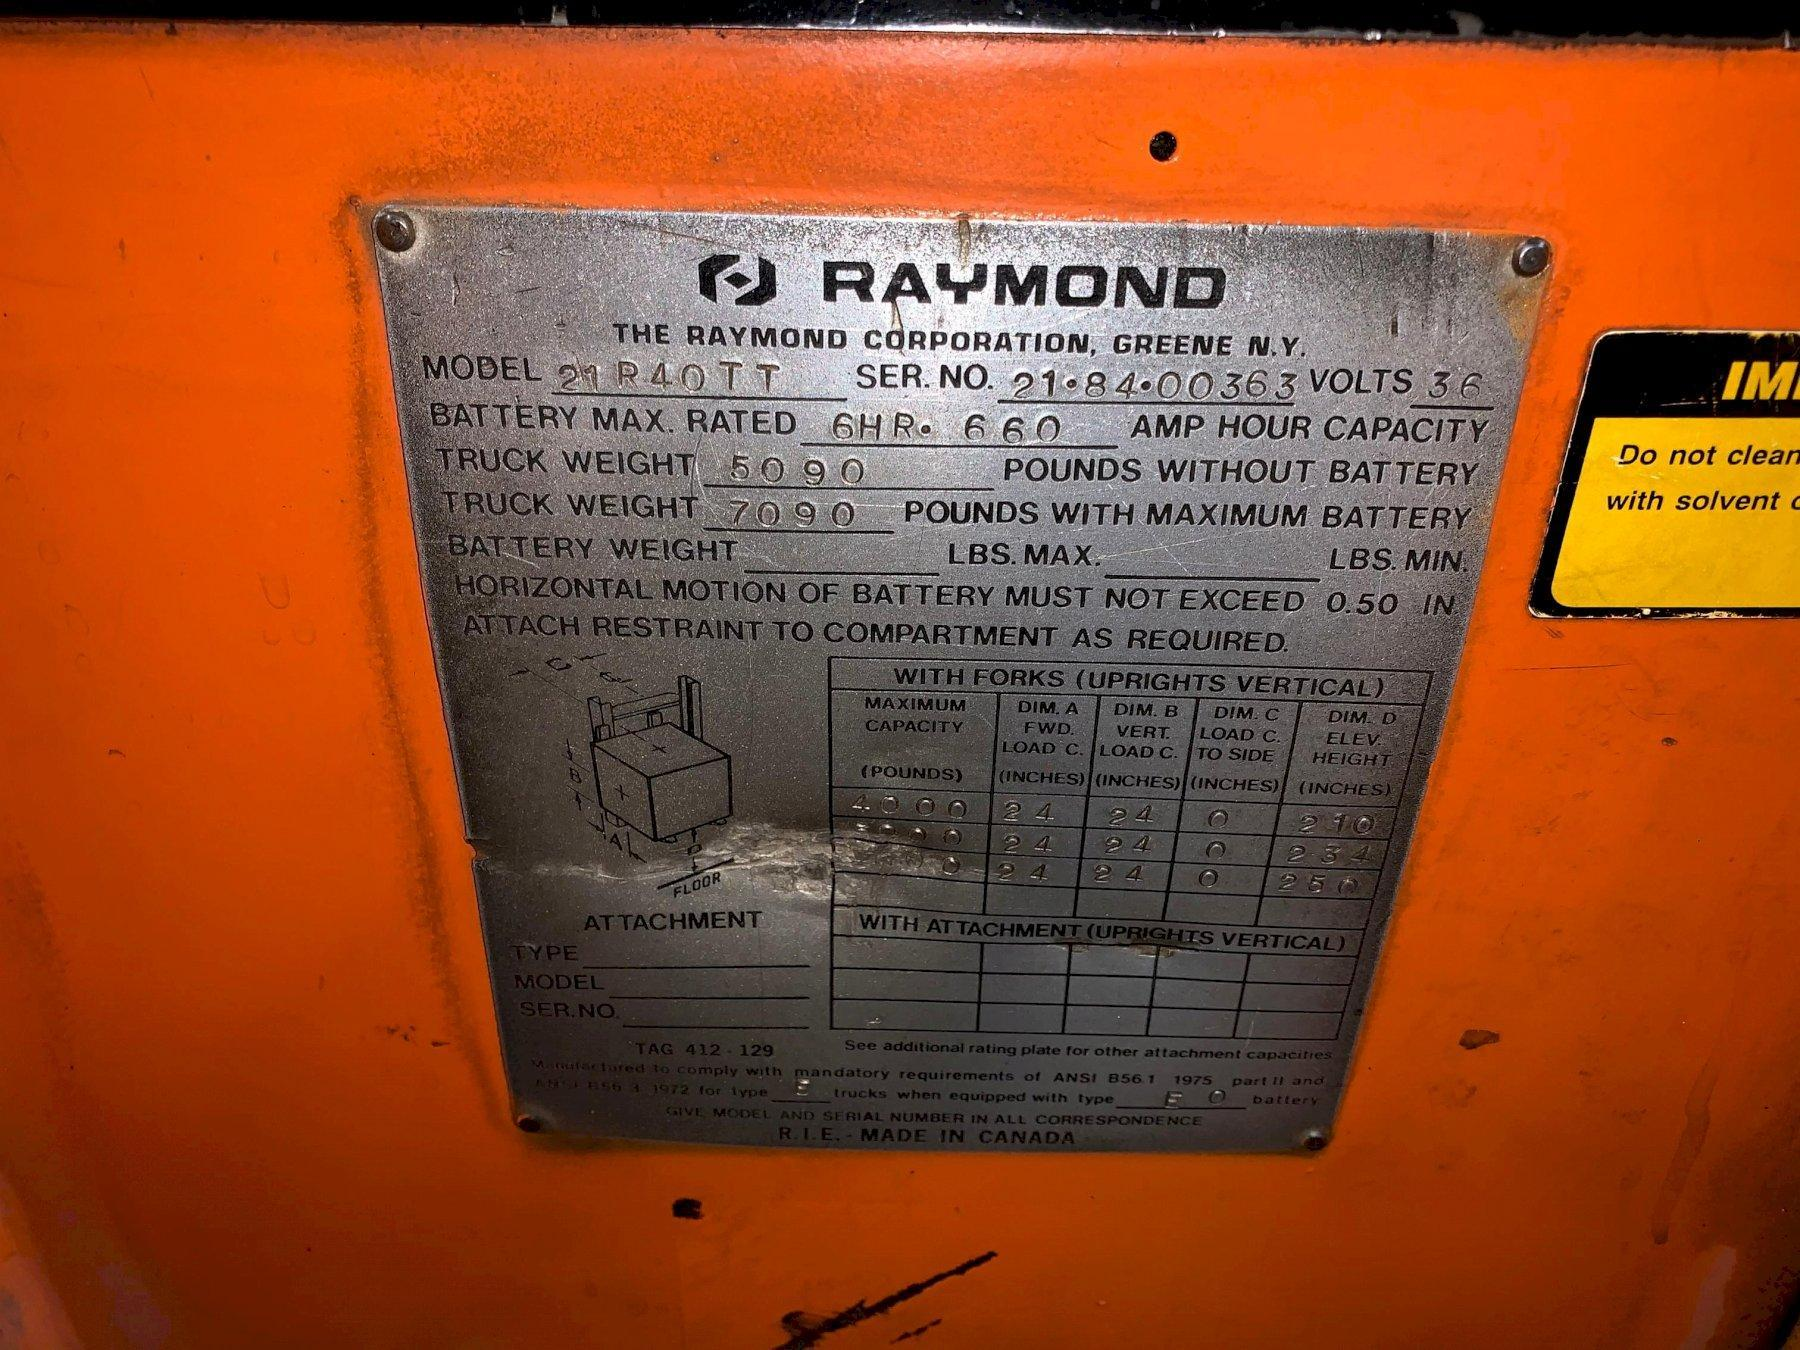 Raymond 4,000Lb Electric Reach Truck